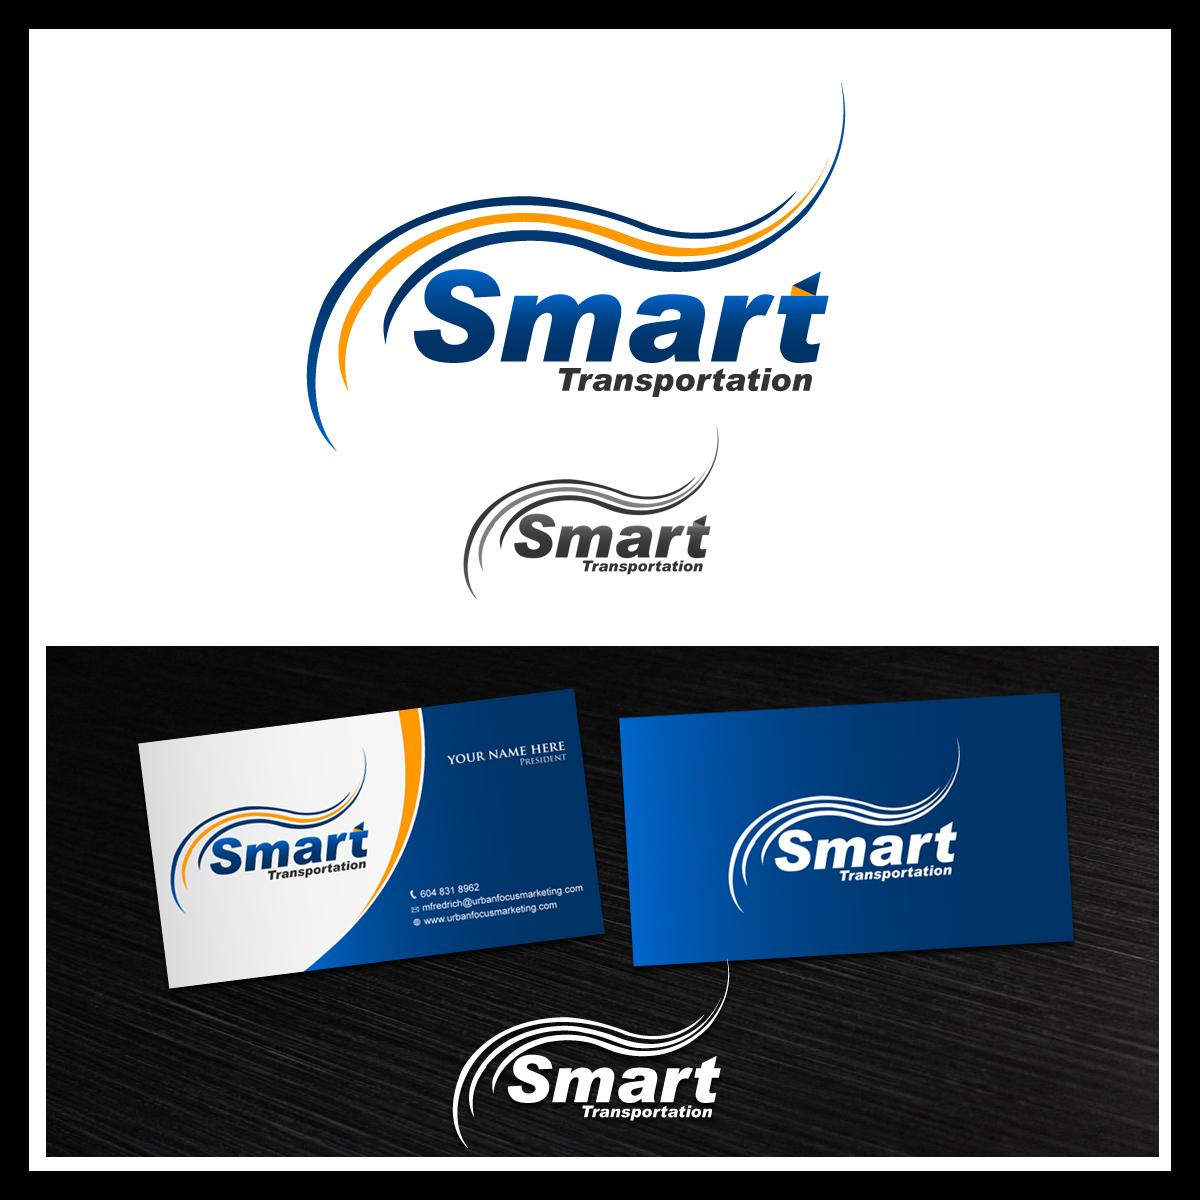 Logo Design by pixdesign - Entry No. 98 in the Logo Design Contest Imaginative Logo Design for Smart Transportation.